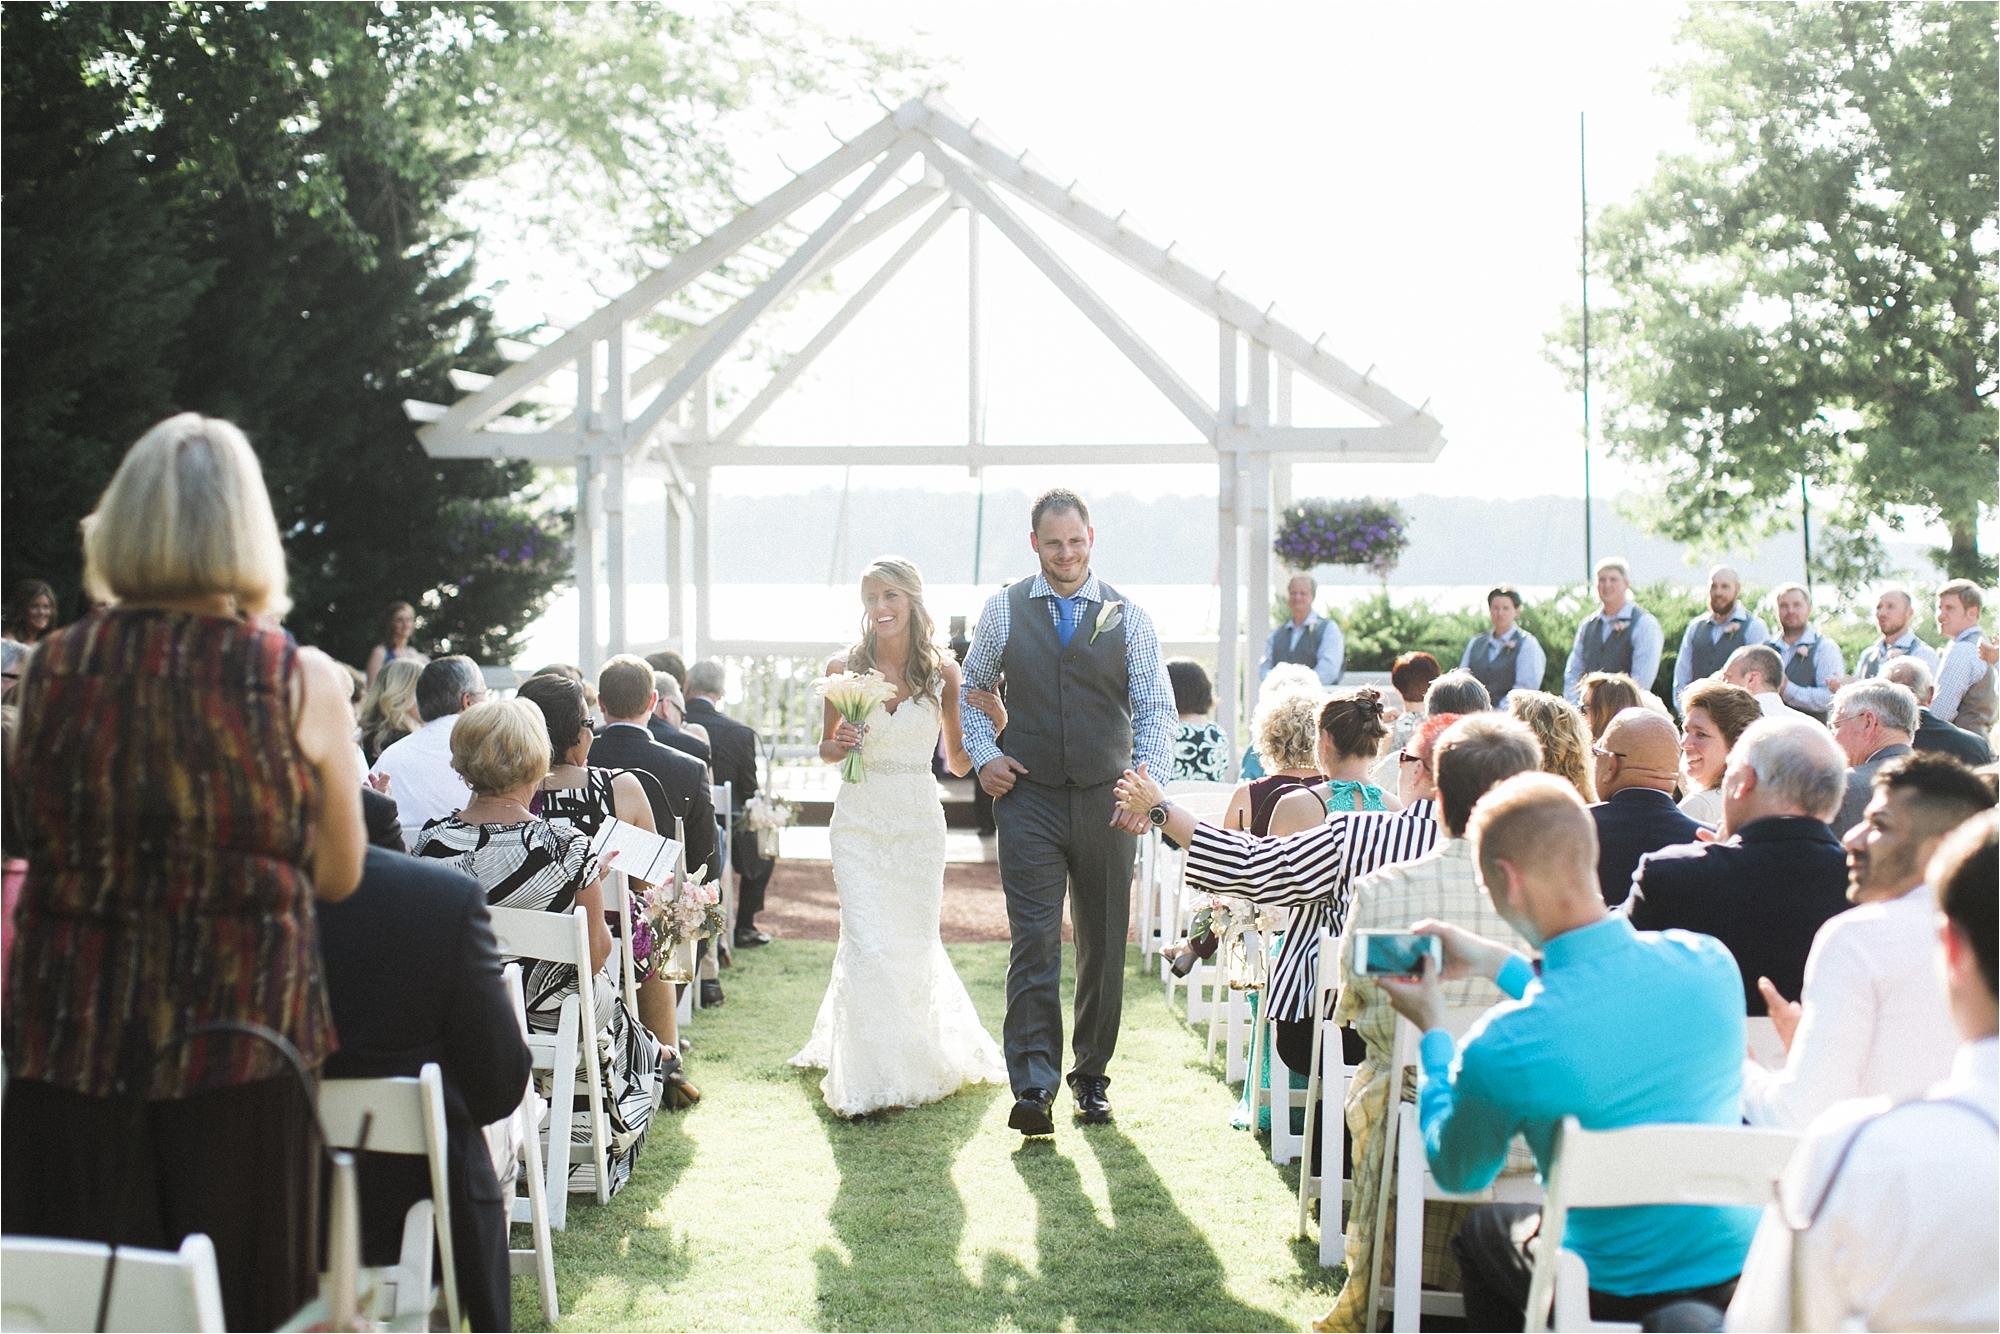 stephanie-yonce-boathouse-sunday-park-virginia-wedding-photo-019.JPG